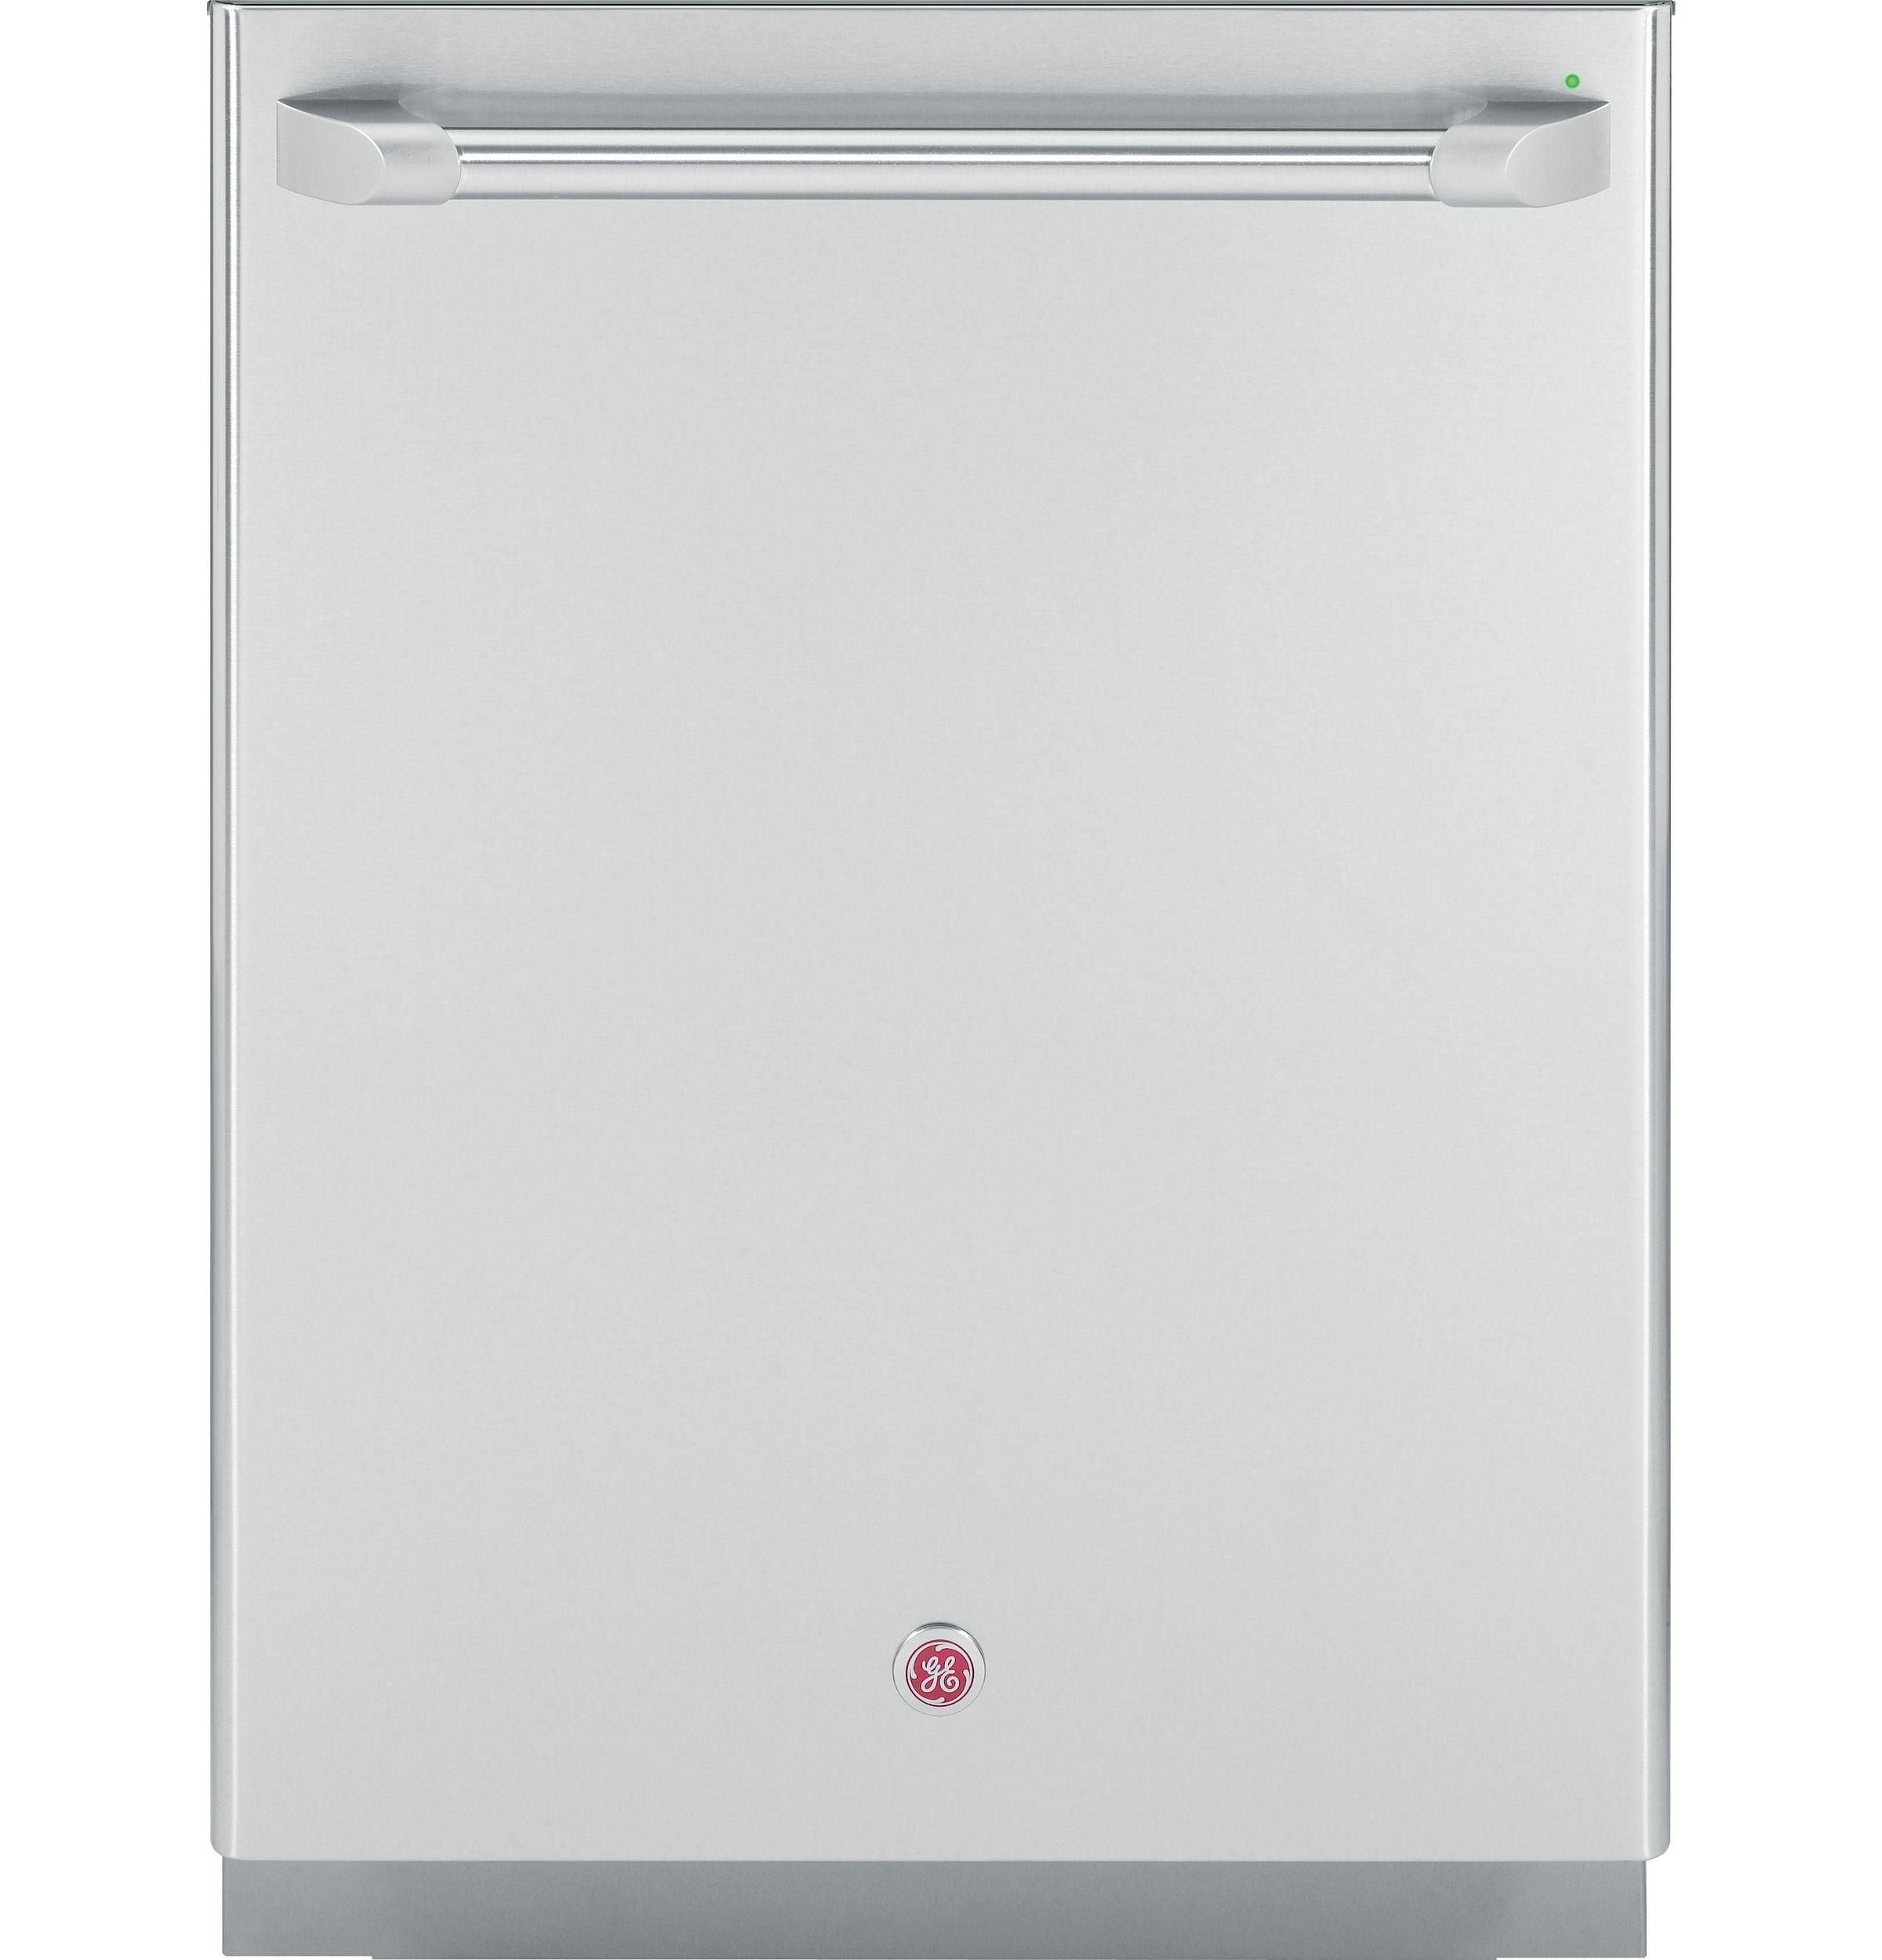 Cdwt980vss Ge Cafe Dishwasher With Smartdispense Technology